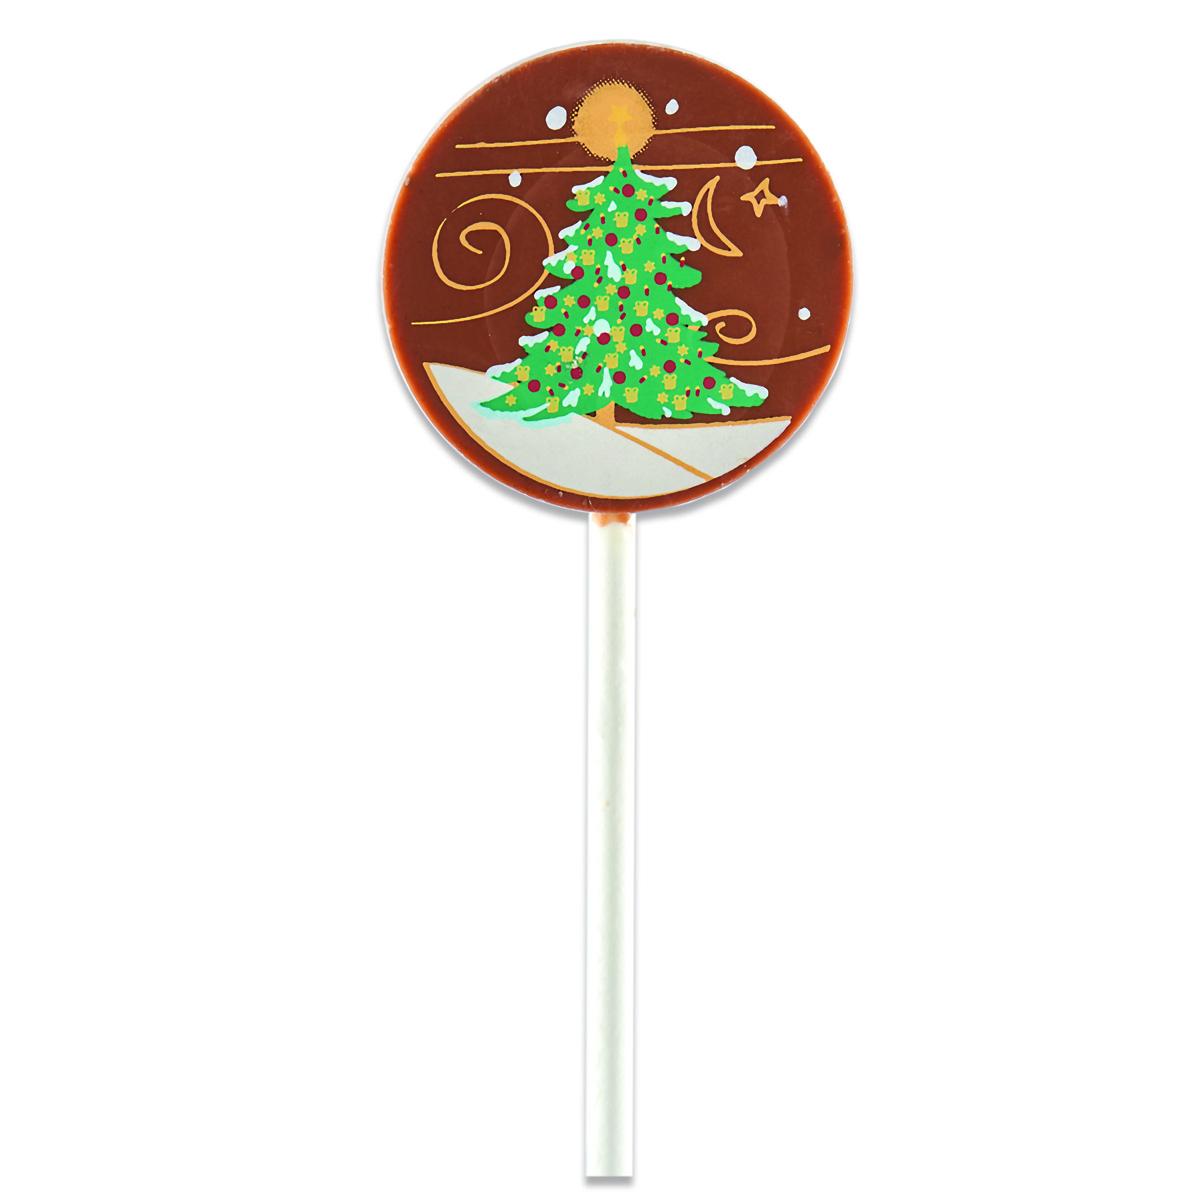 Sucette de Noël ronde, chocolaterie Schaal (10 g)